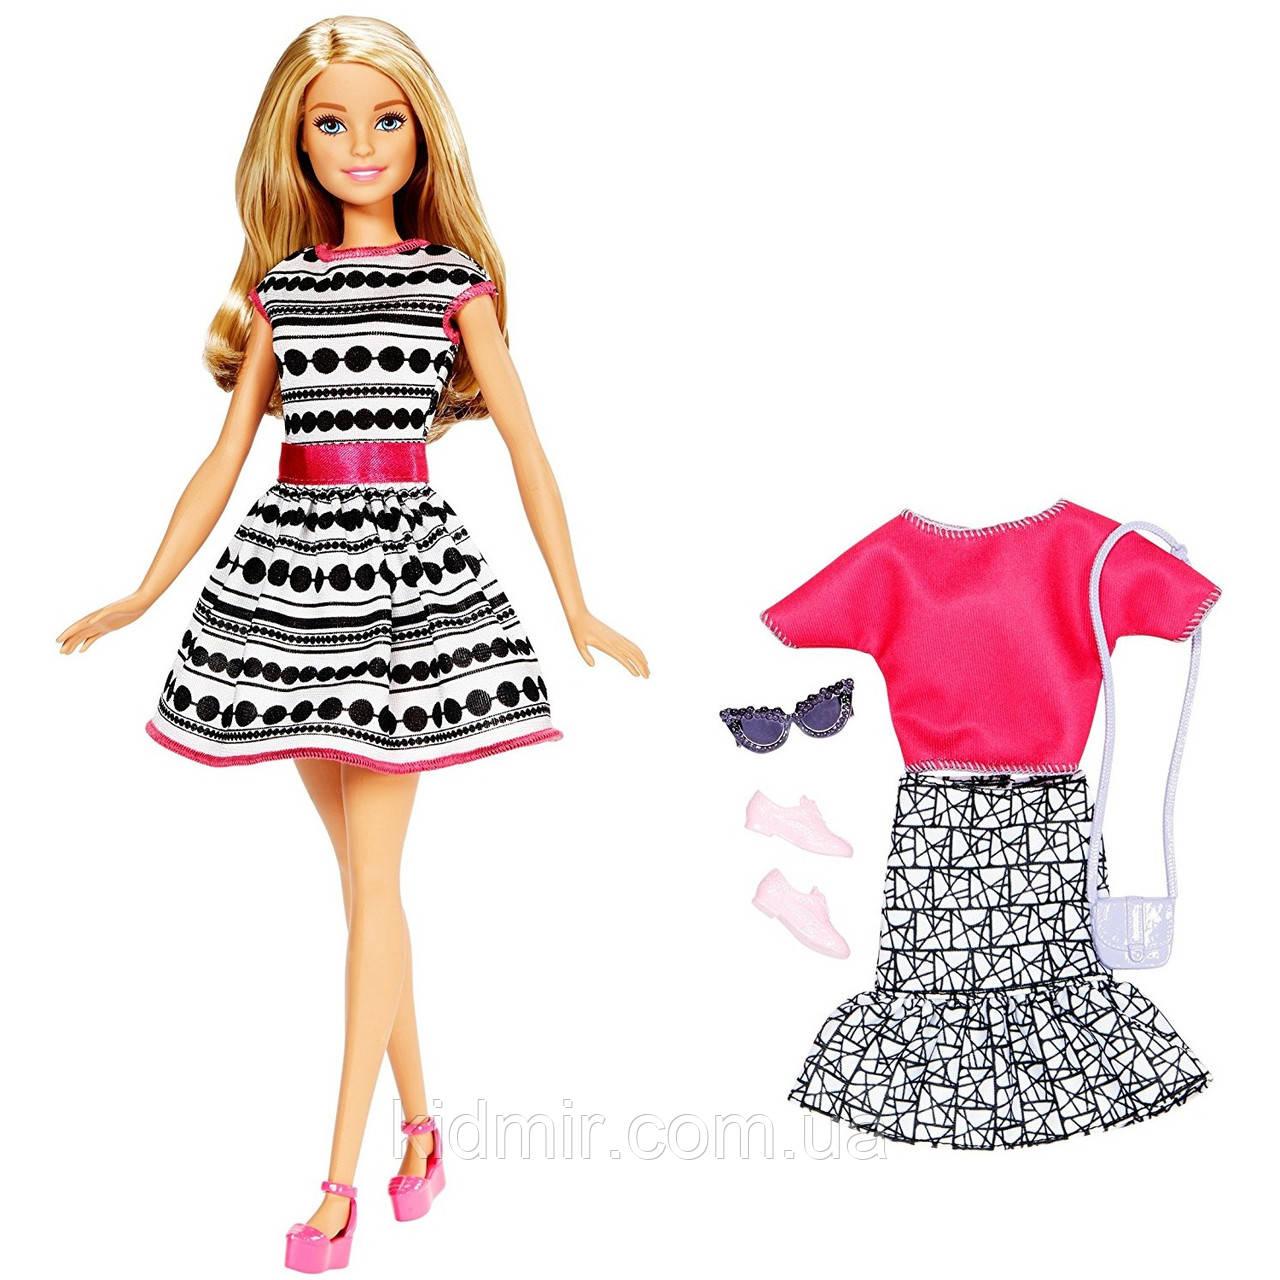 Кукла Барби Модница с одеждой и аксессуарами Barbie Fashions FFF59